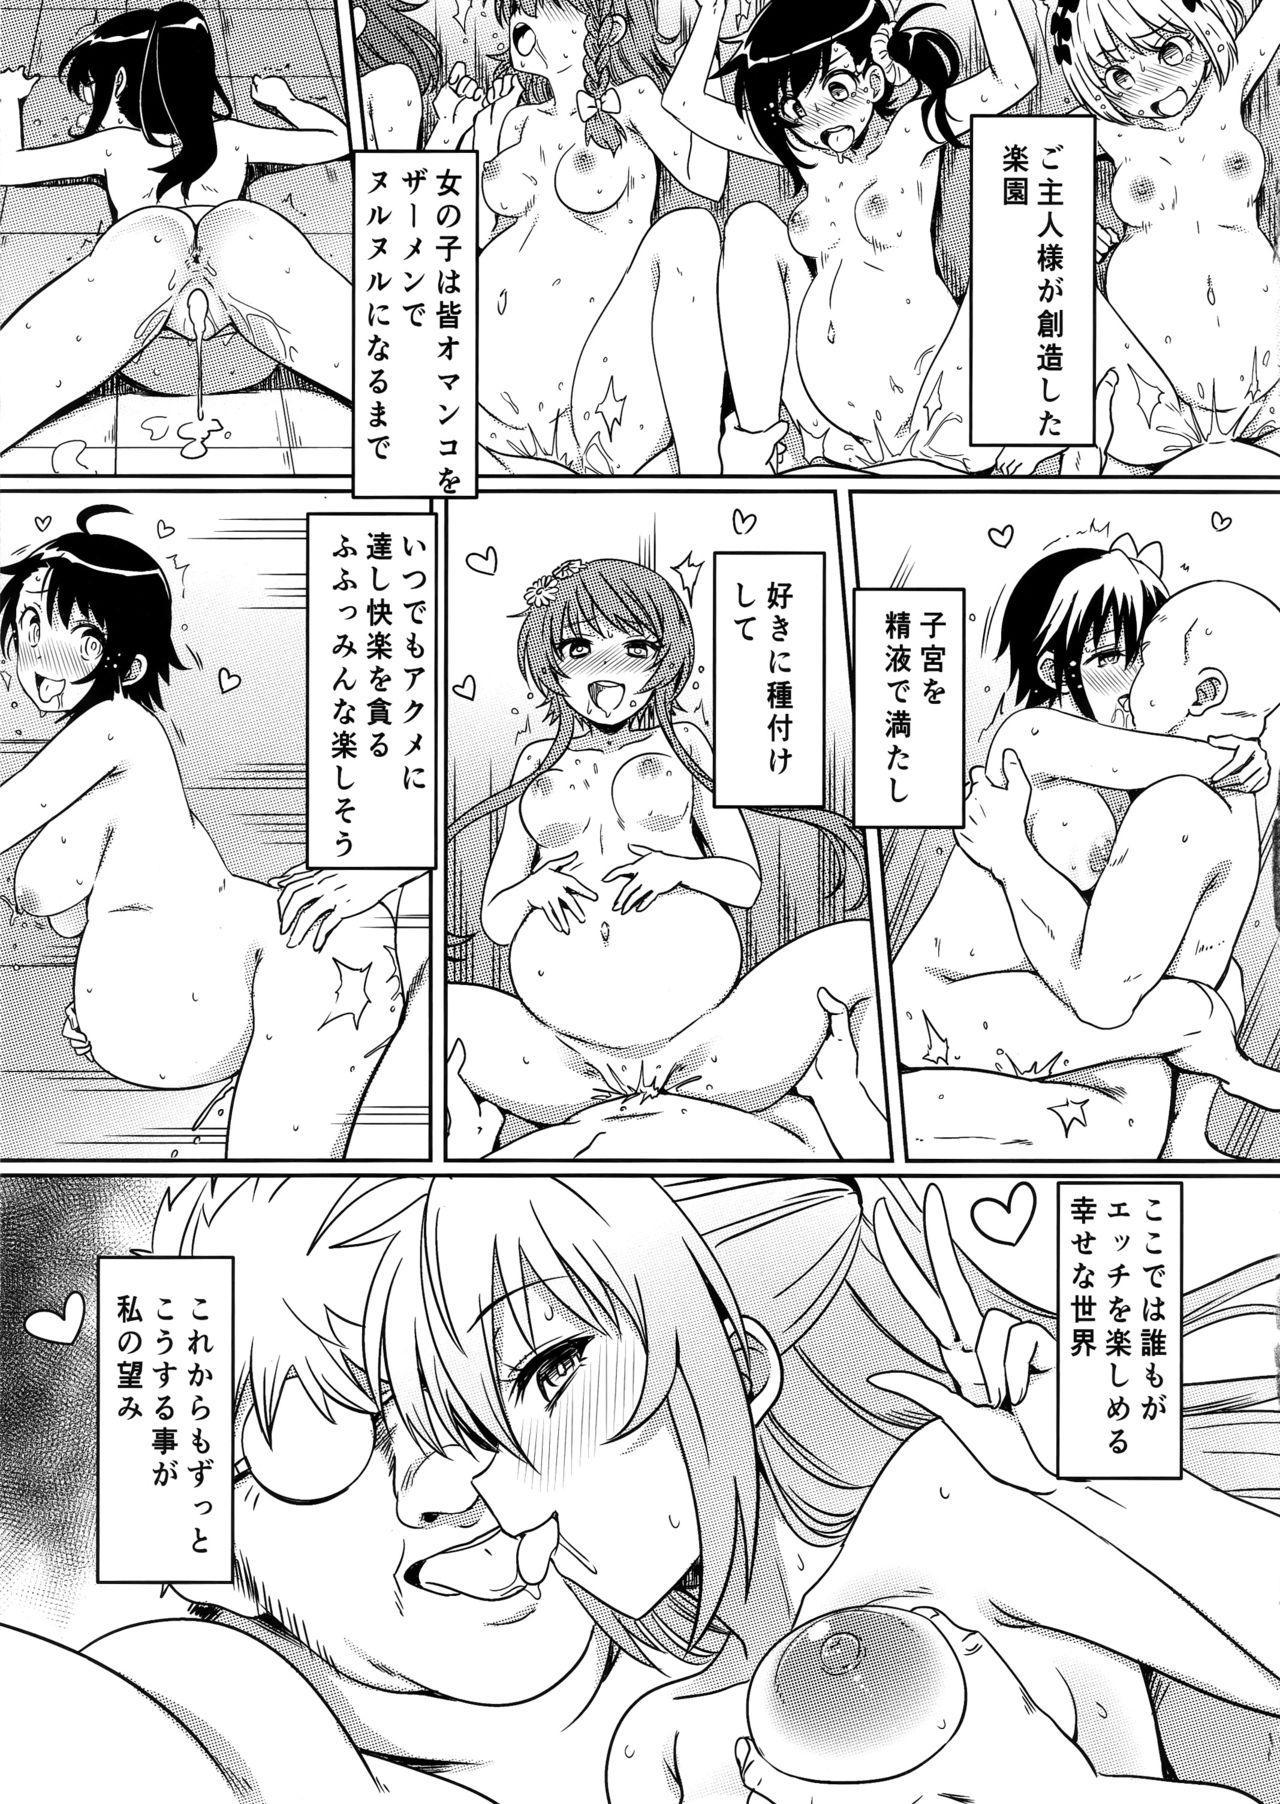 (C96) [Kaminari-neko (Eitarou)] Yamikoi -Saimin- 4 (Nisekoi) 23